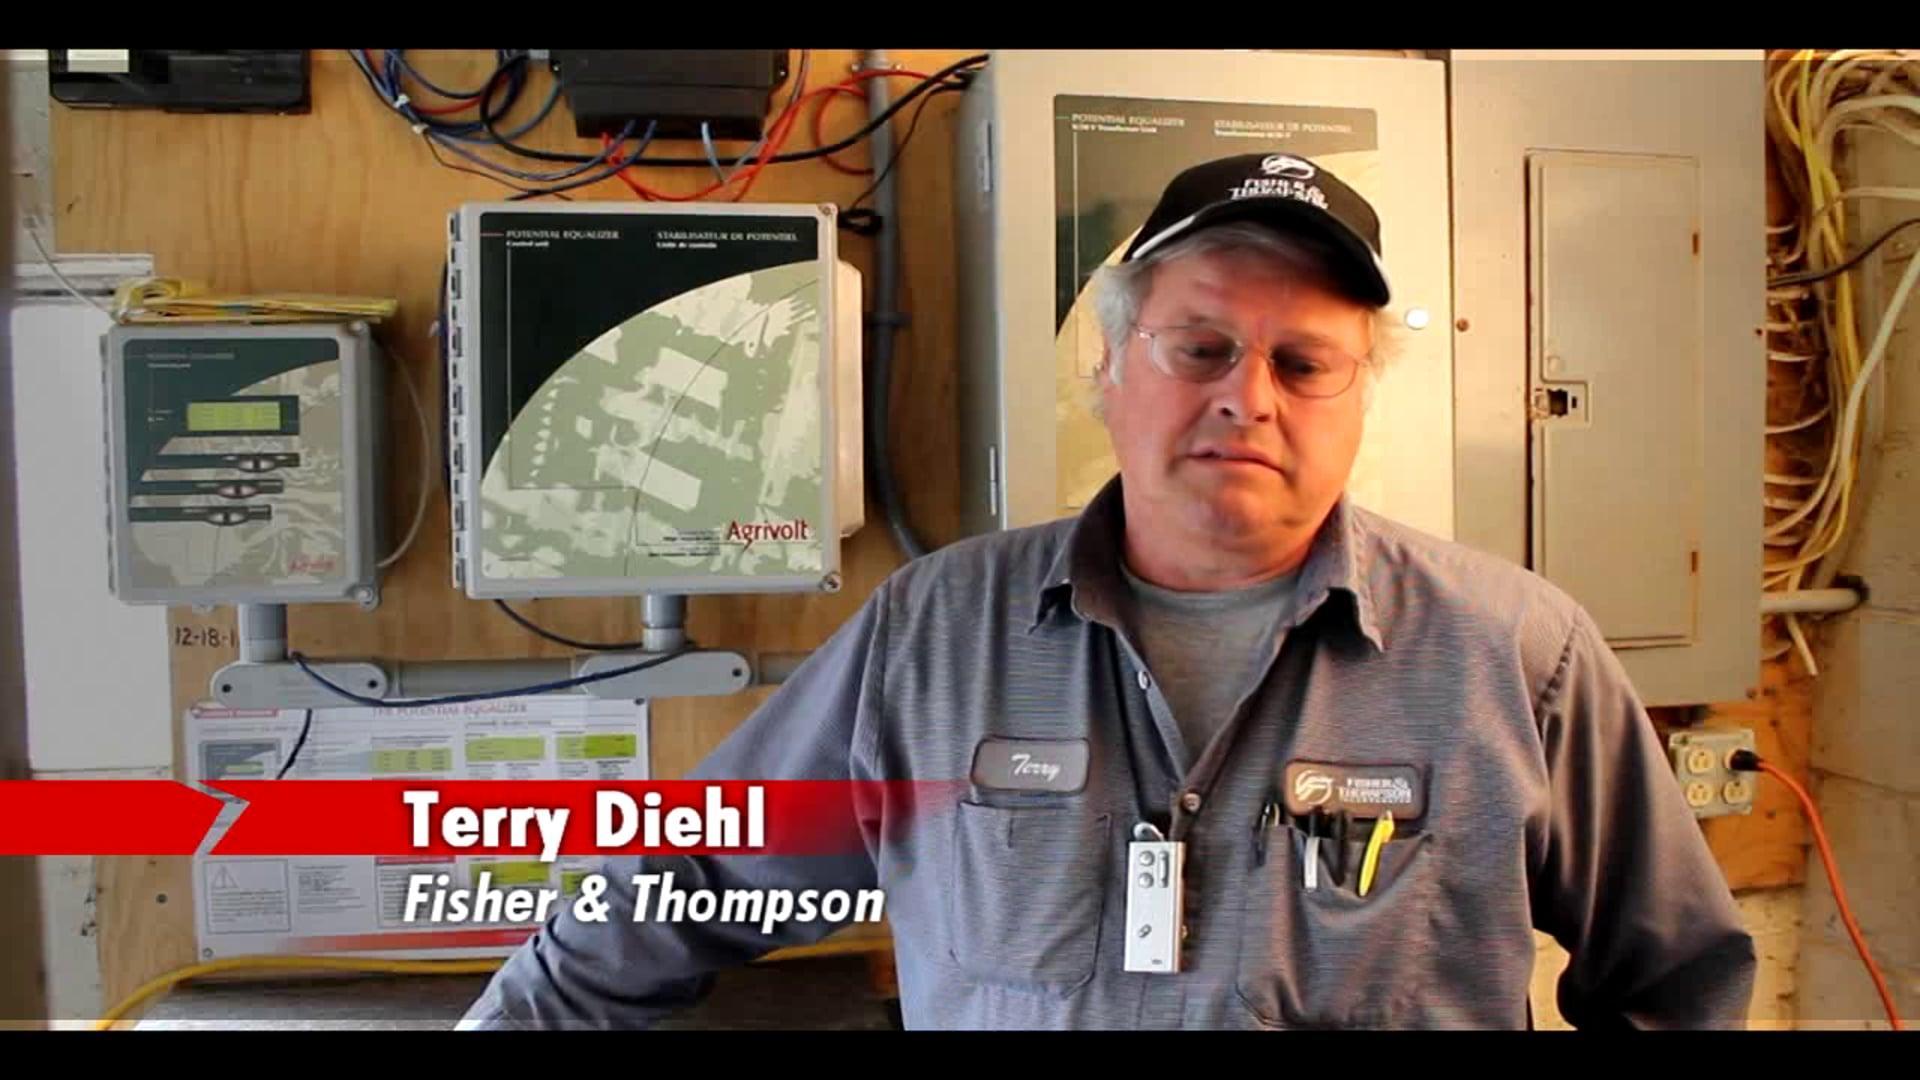 Agrivolt-2-TERRY DIEHL